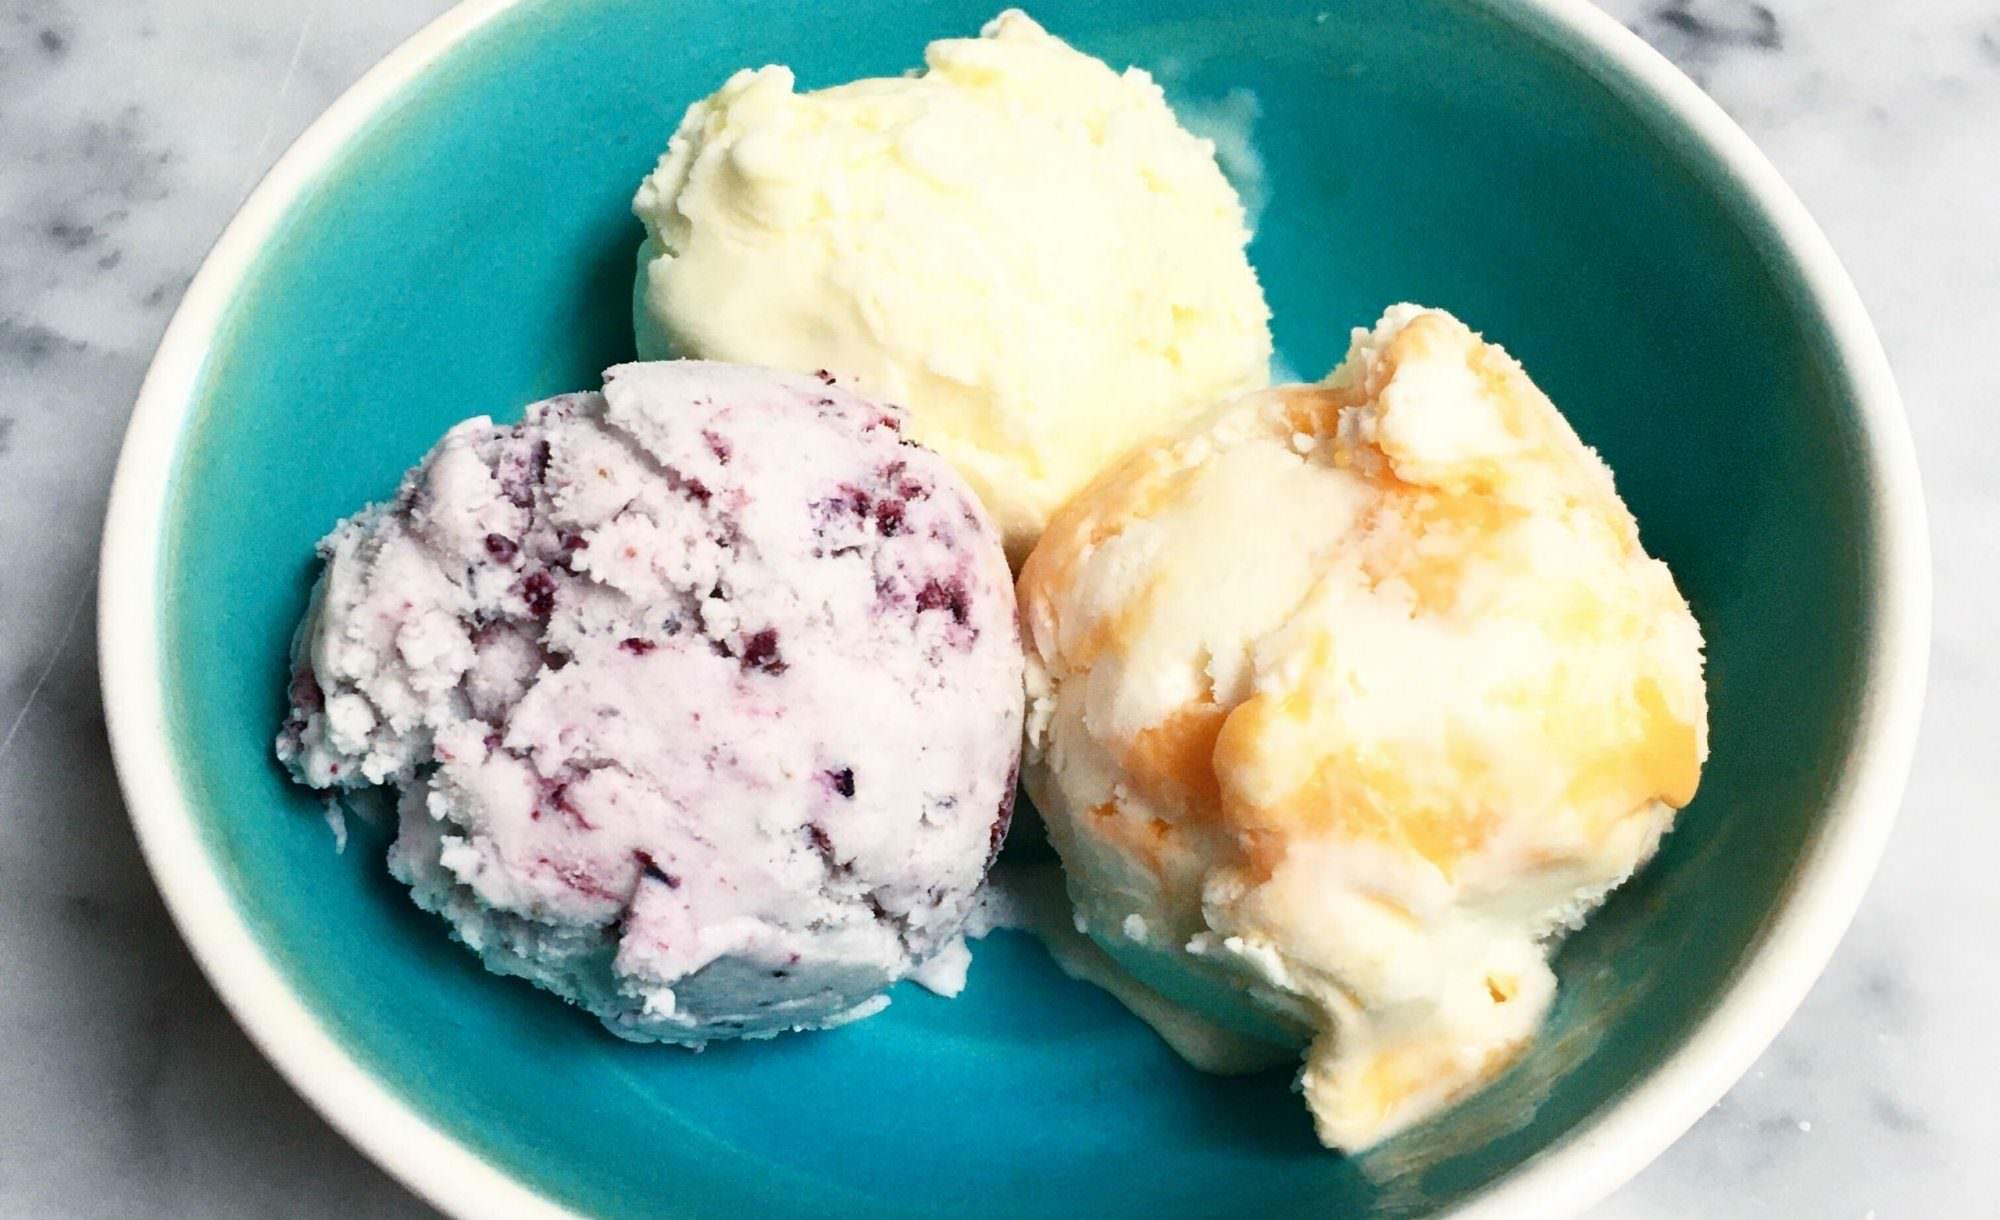 Food Frenzy ice cream sale photo